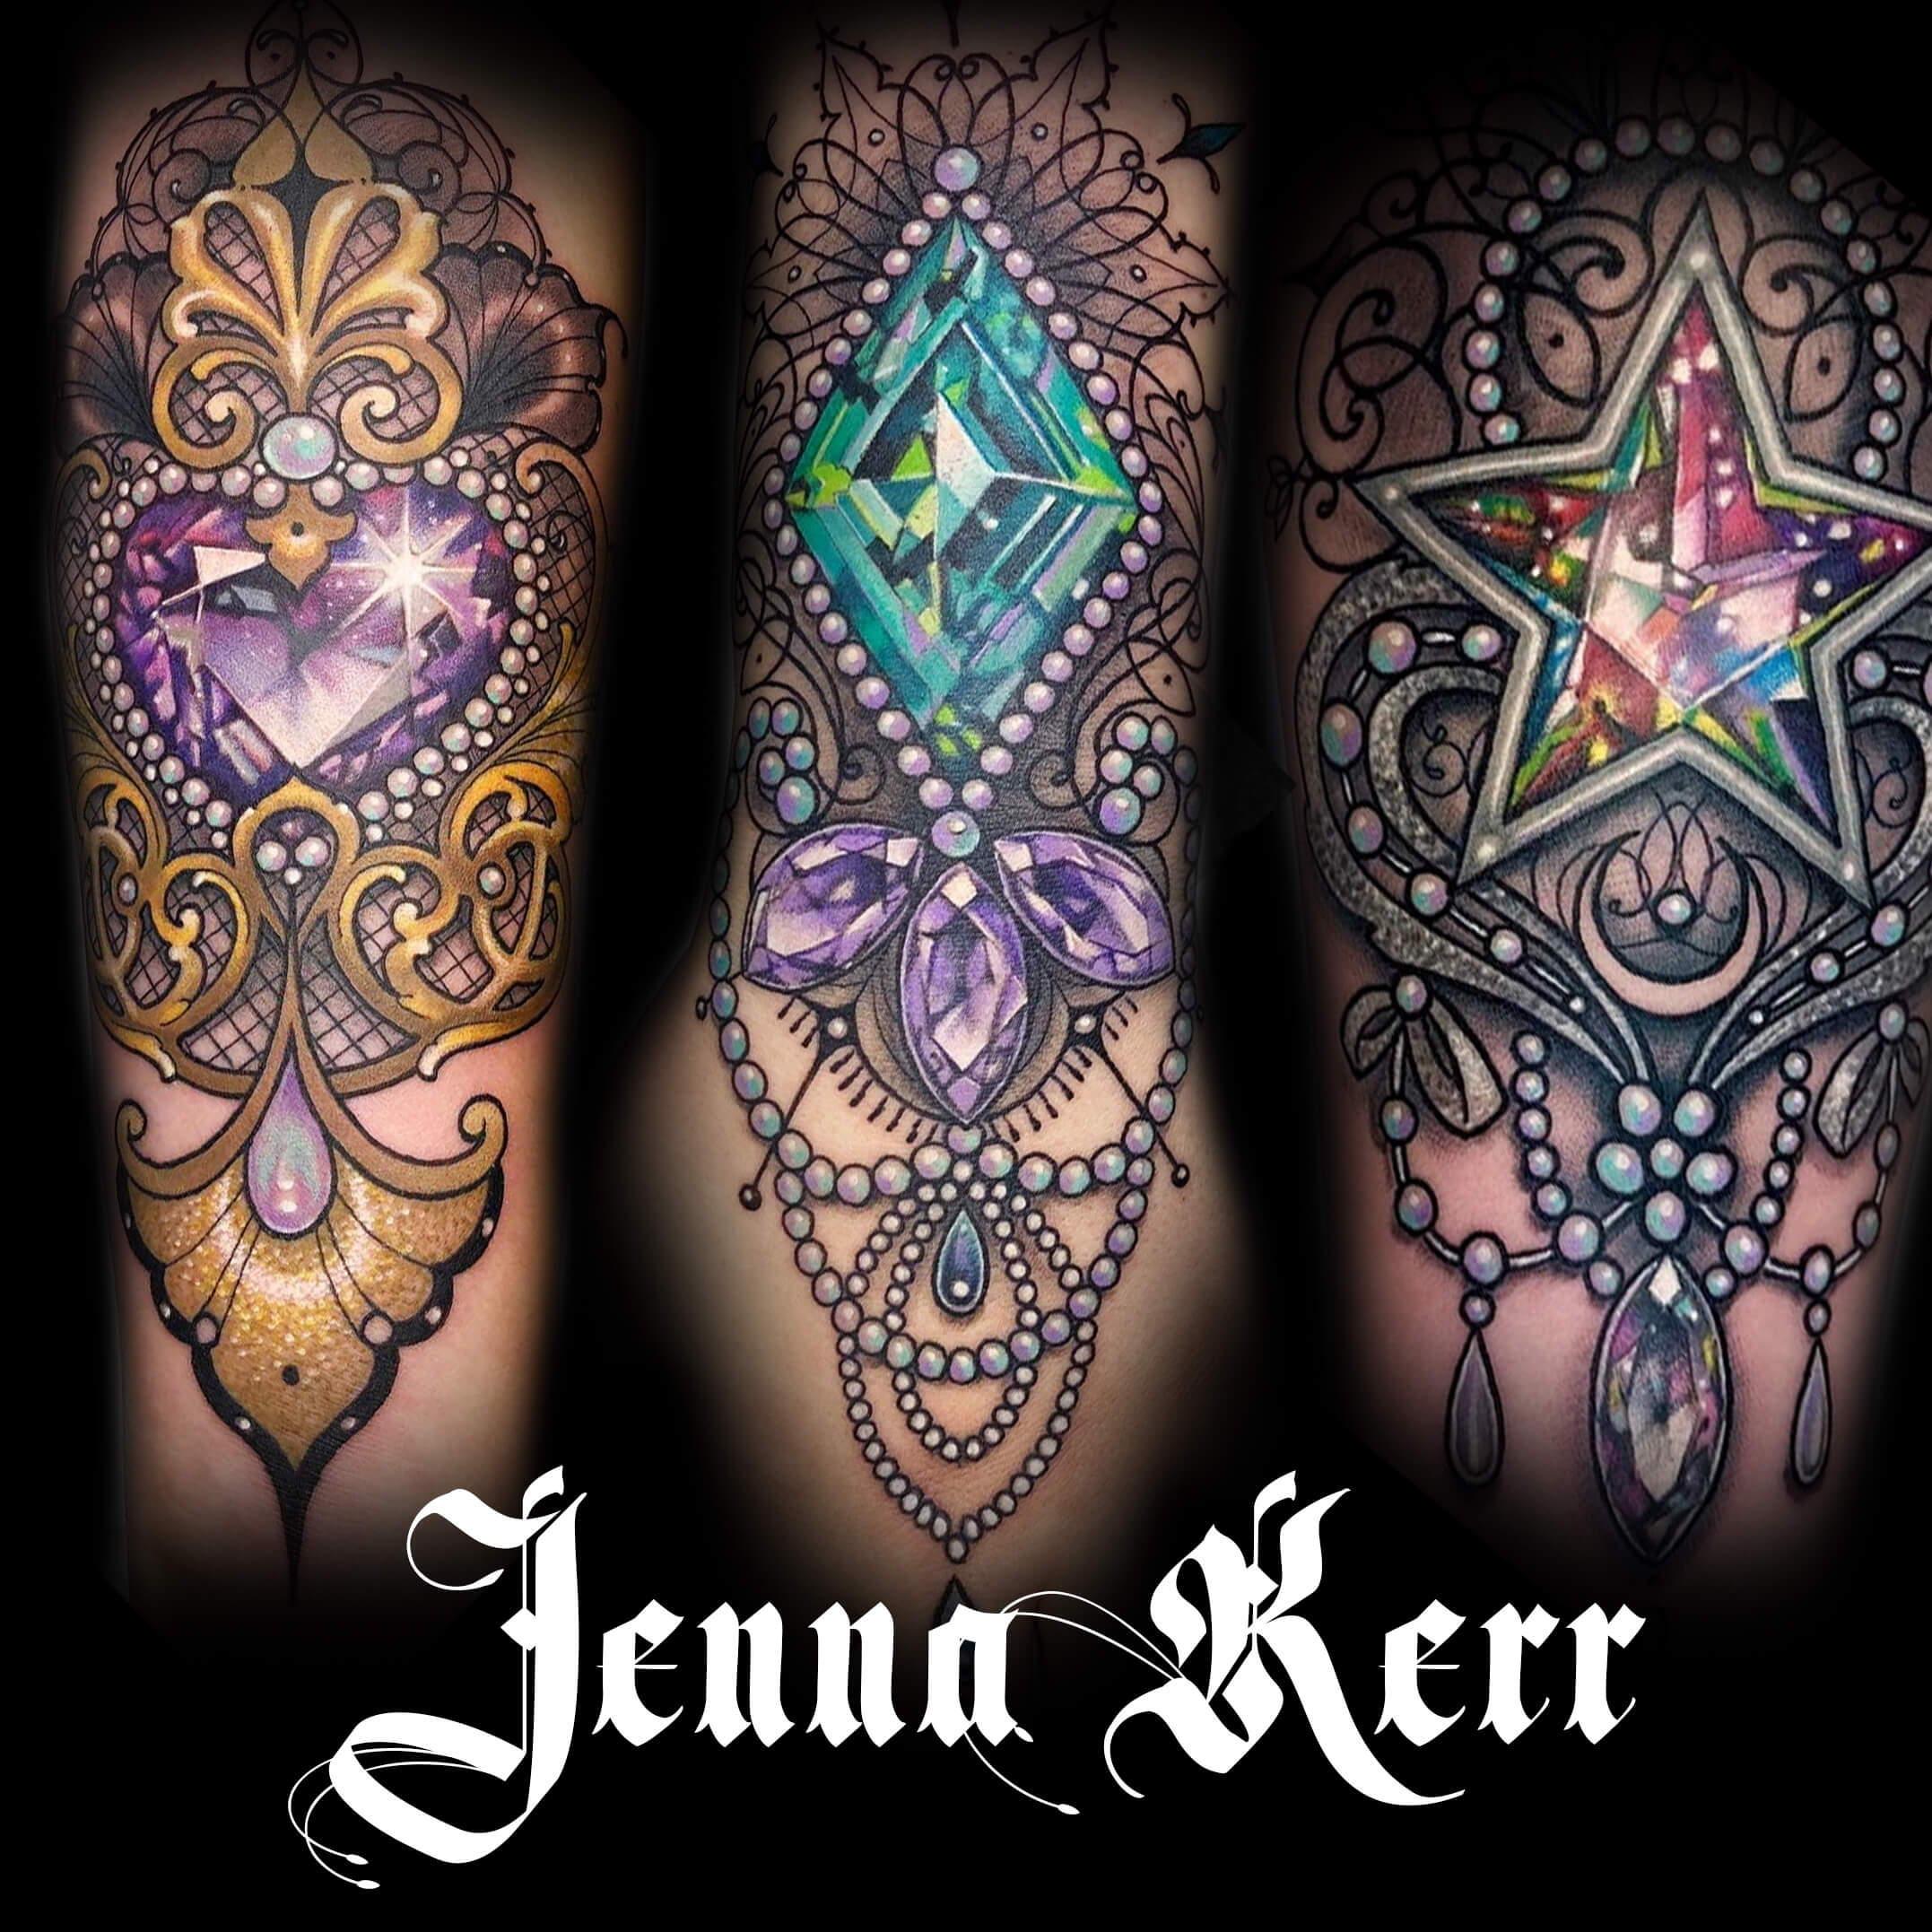 Jenna Kerr Pro Series Set